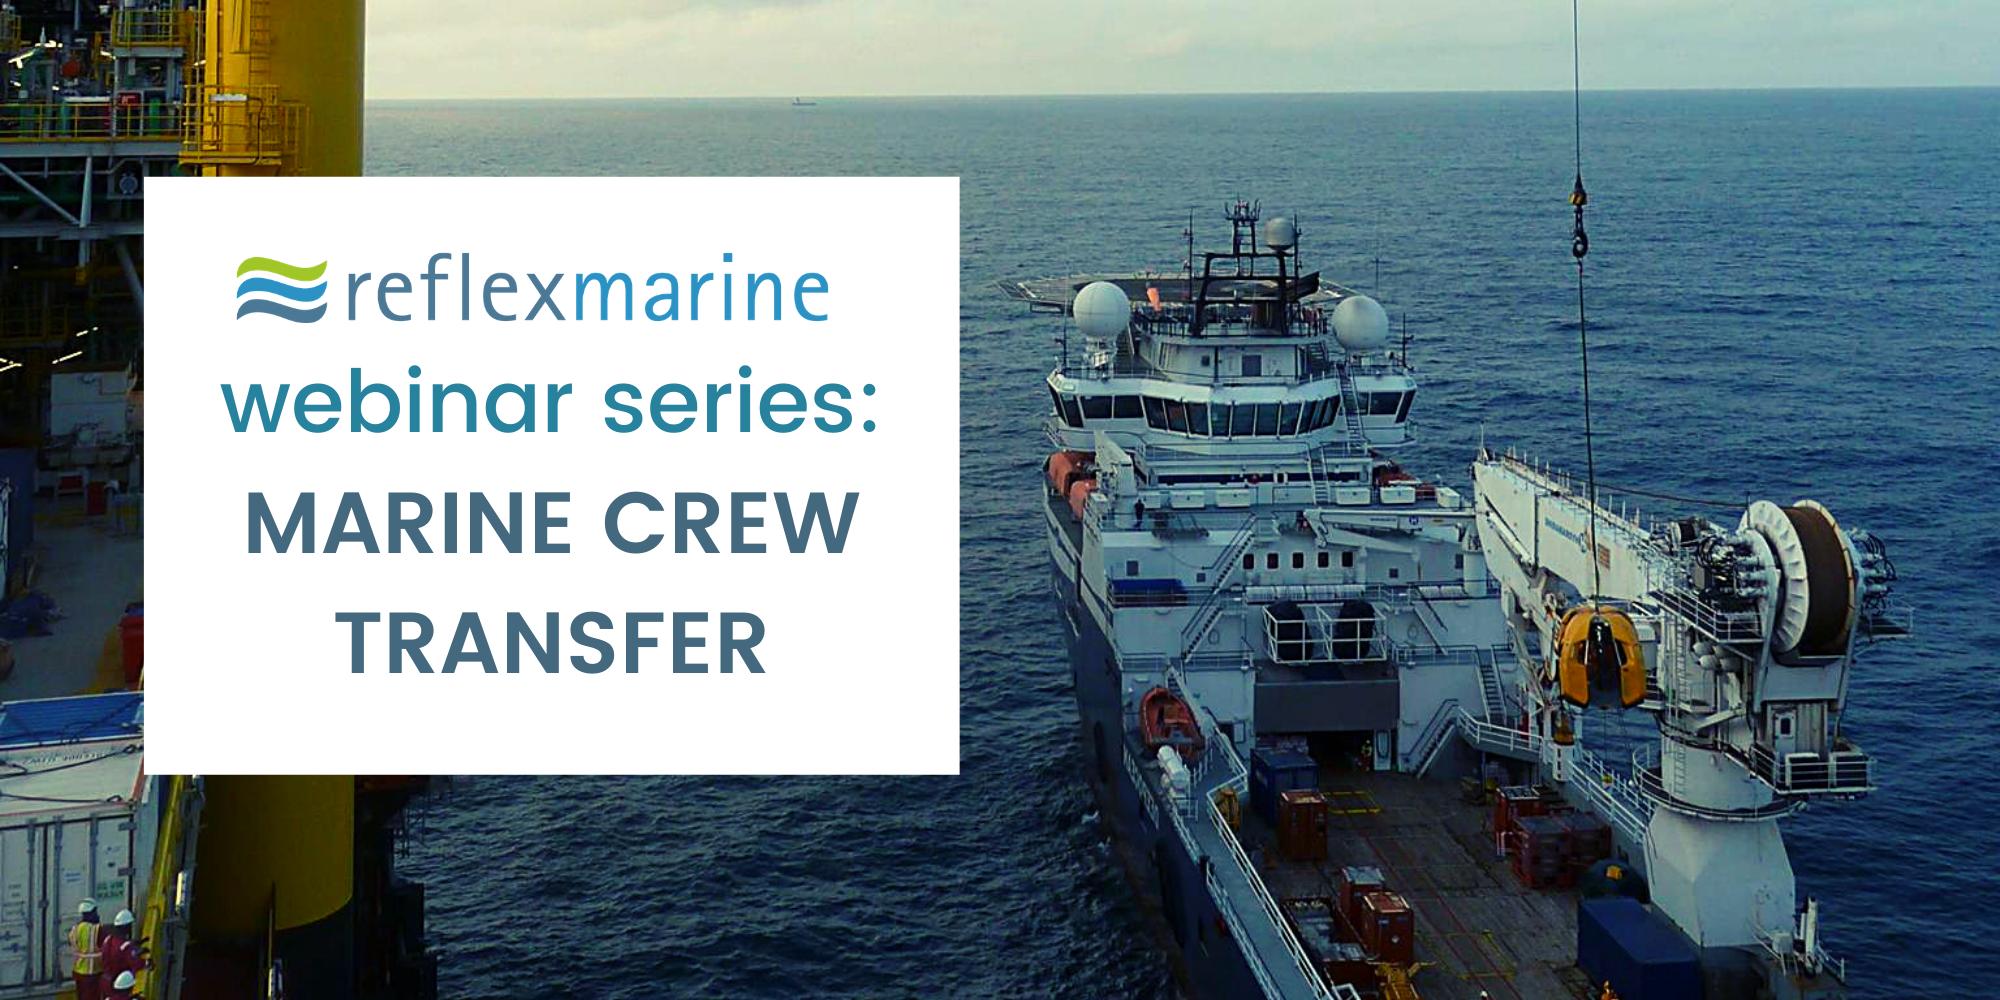 Read Reflex Marine's webinar series